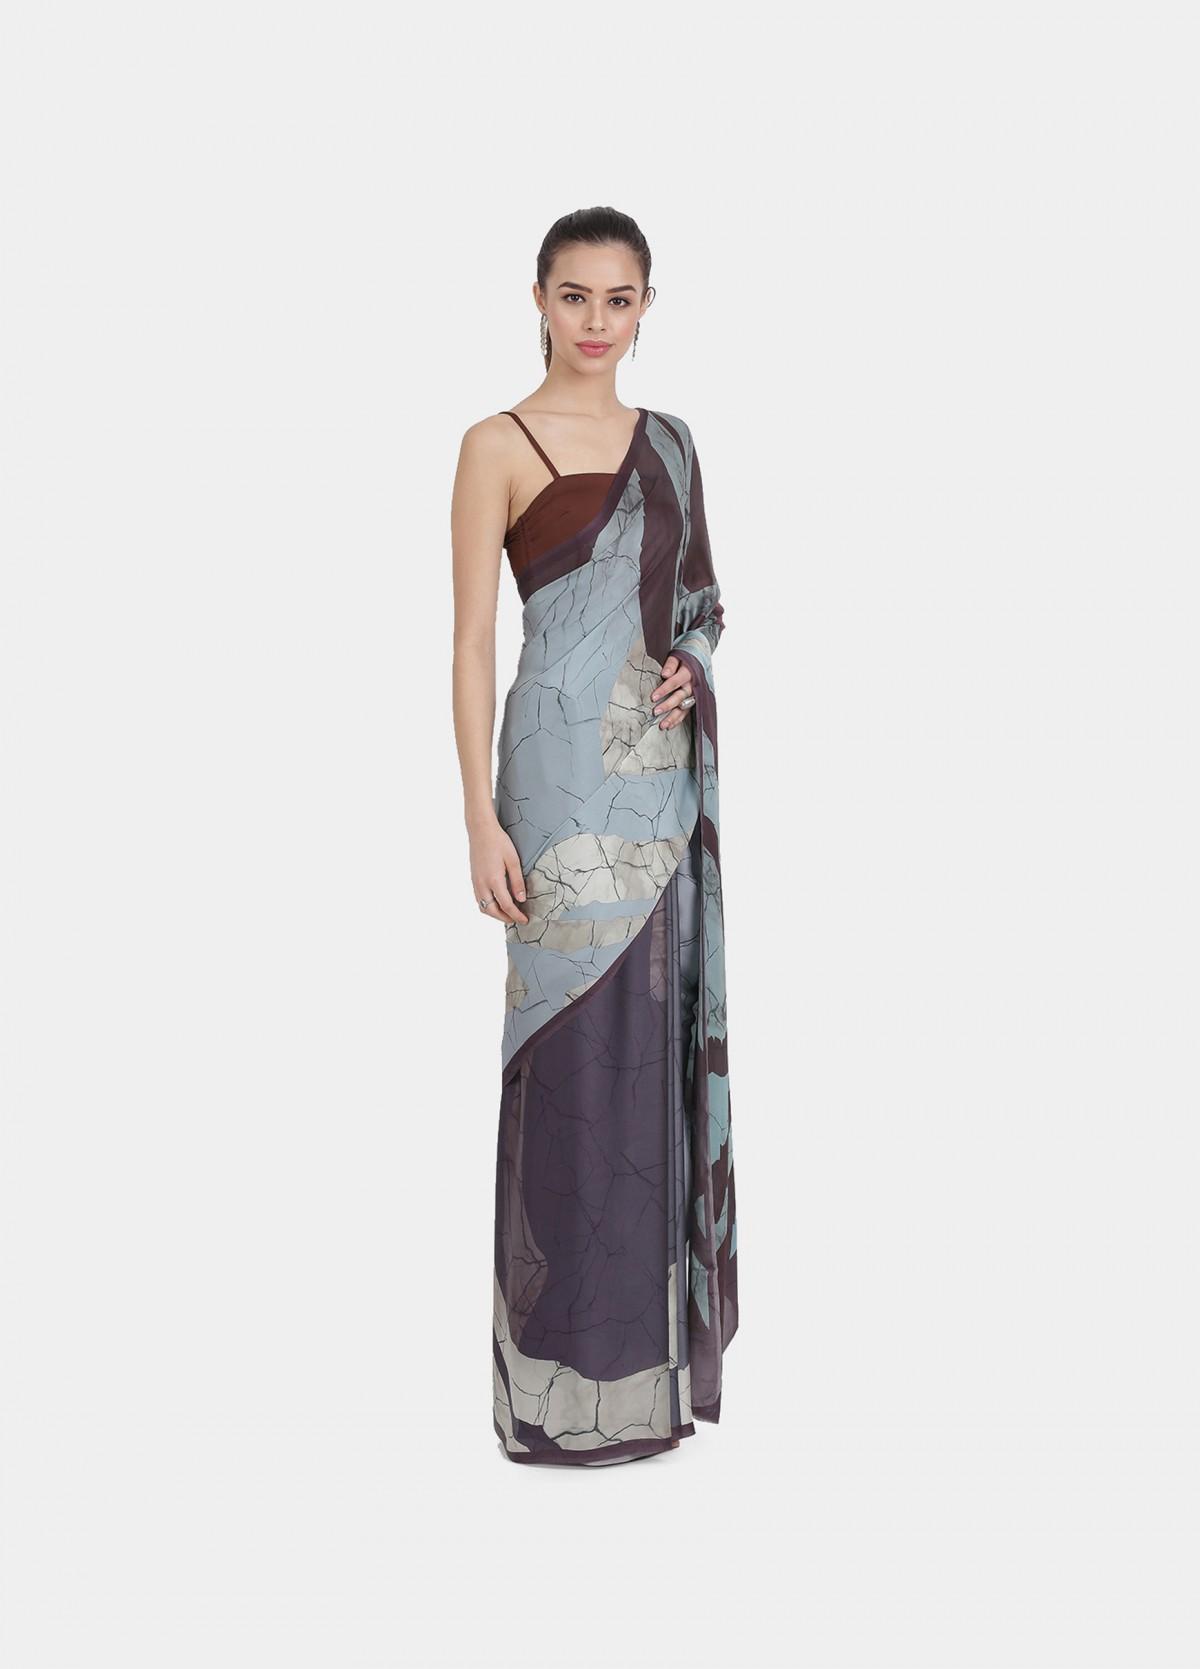 The Moody Marti Sari